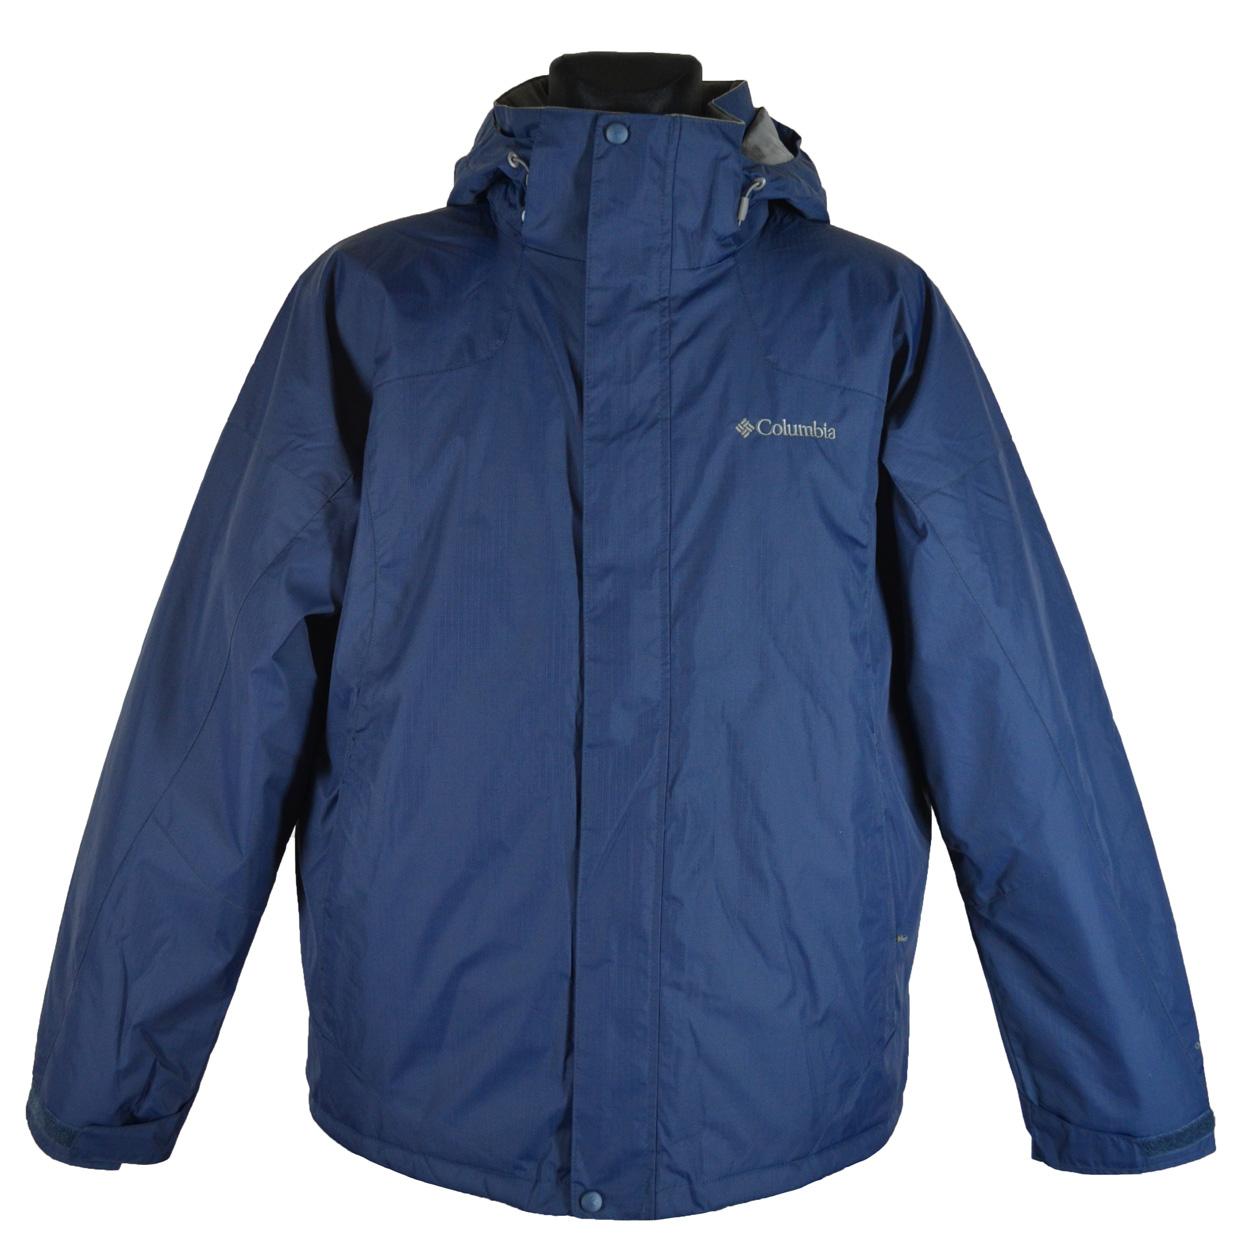 Columbia Киев - мужские куртки 1cefcce266c33